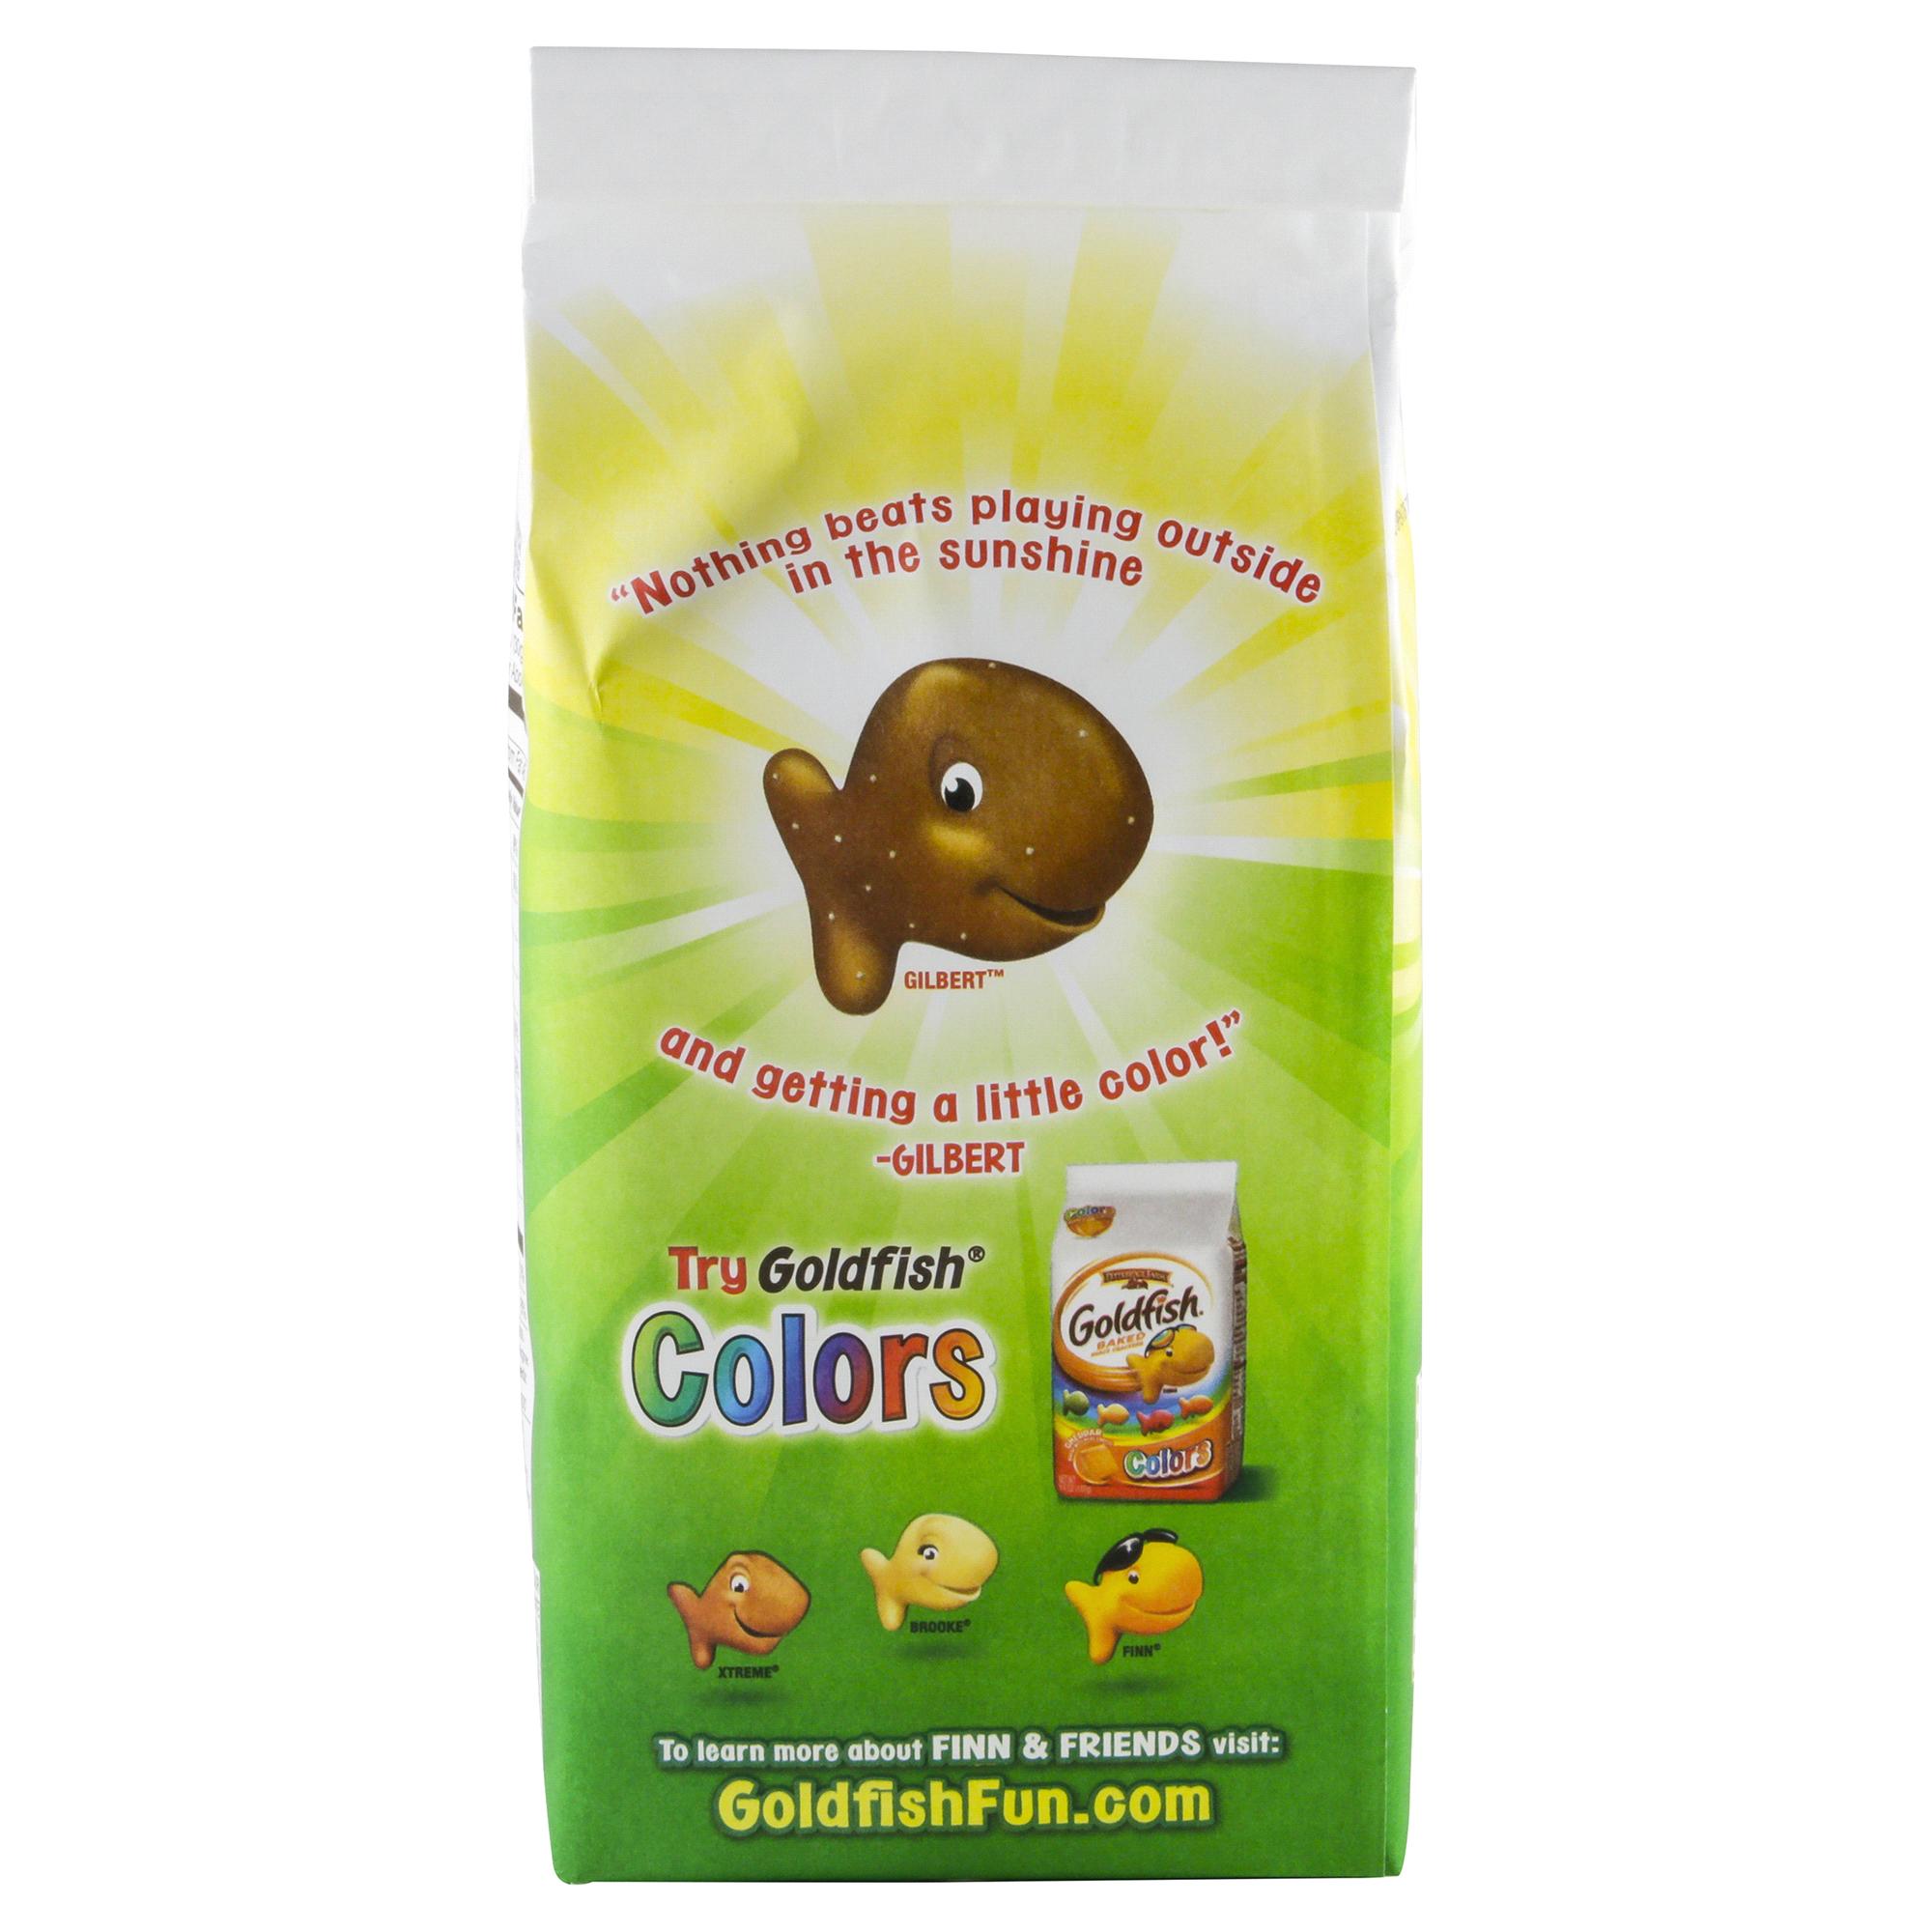 Pepperidge Farm Goldfish Crackers Parmesan - 6.6 oz | Meijer.com